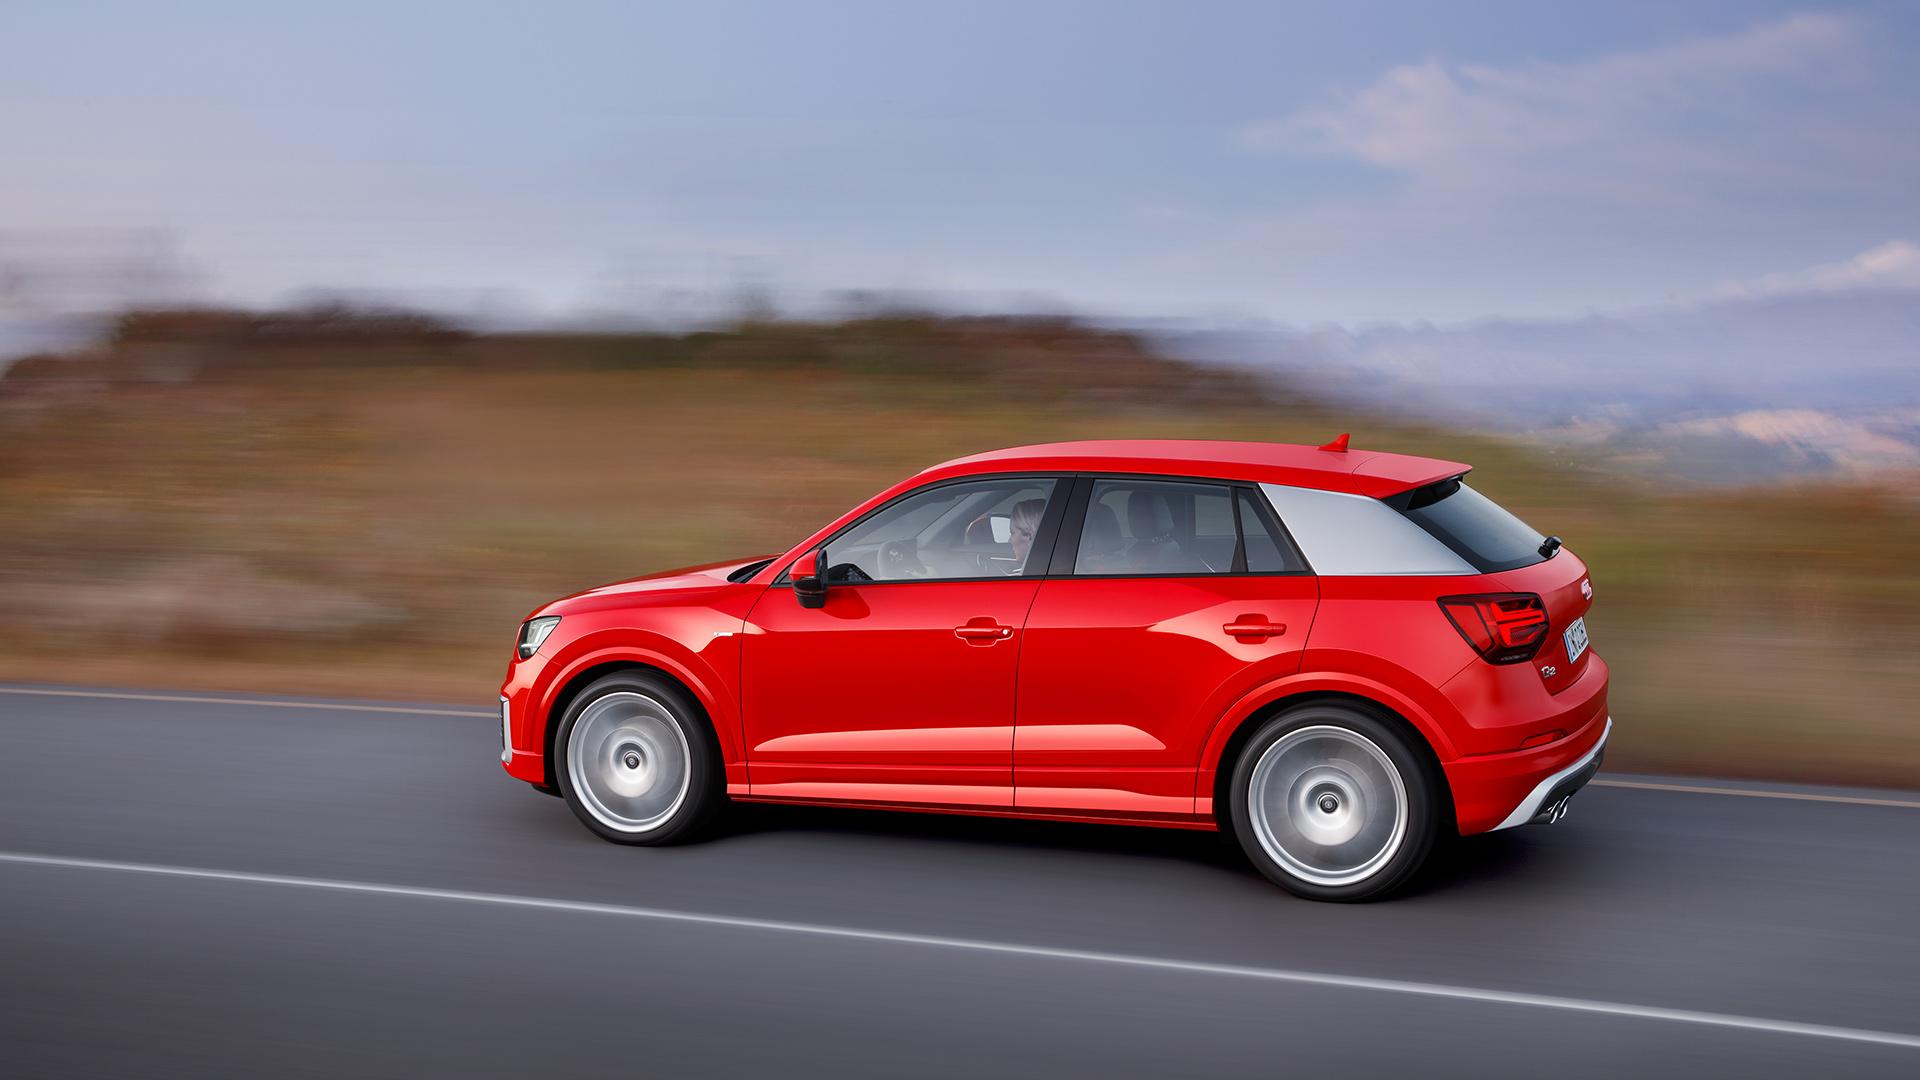 Audi Q2 Lindsay Saker Audi South Africa